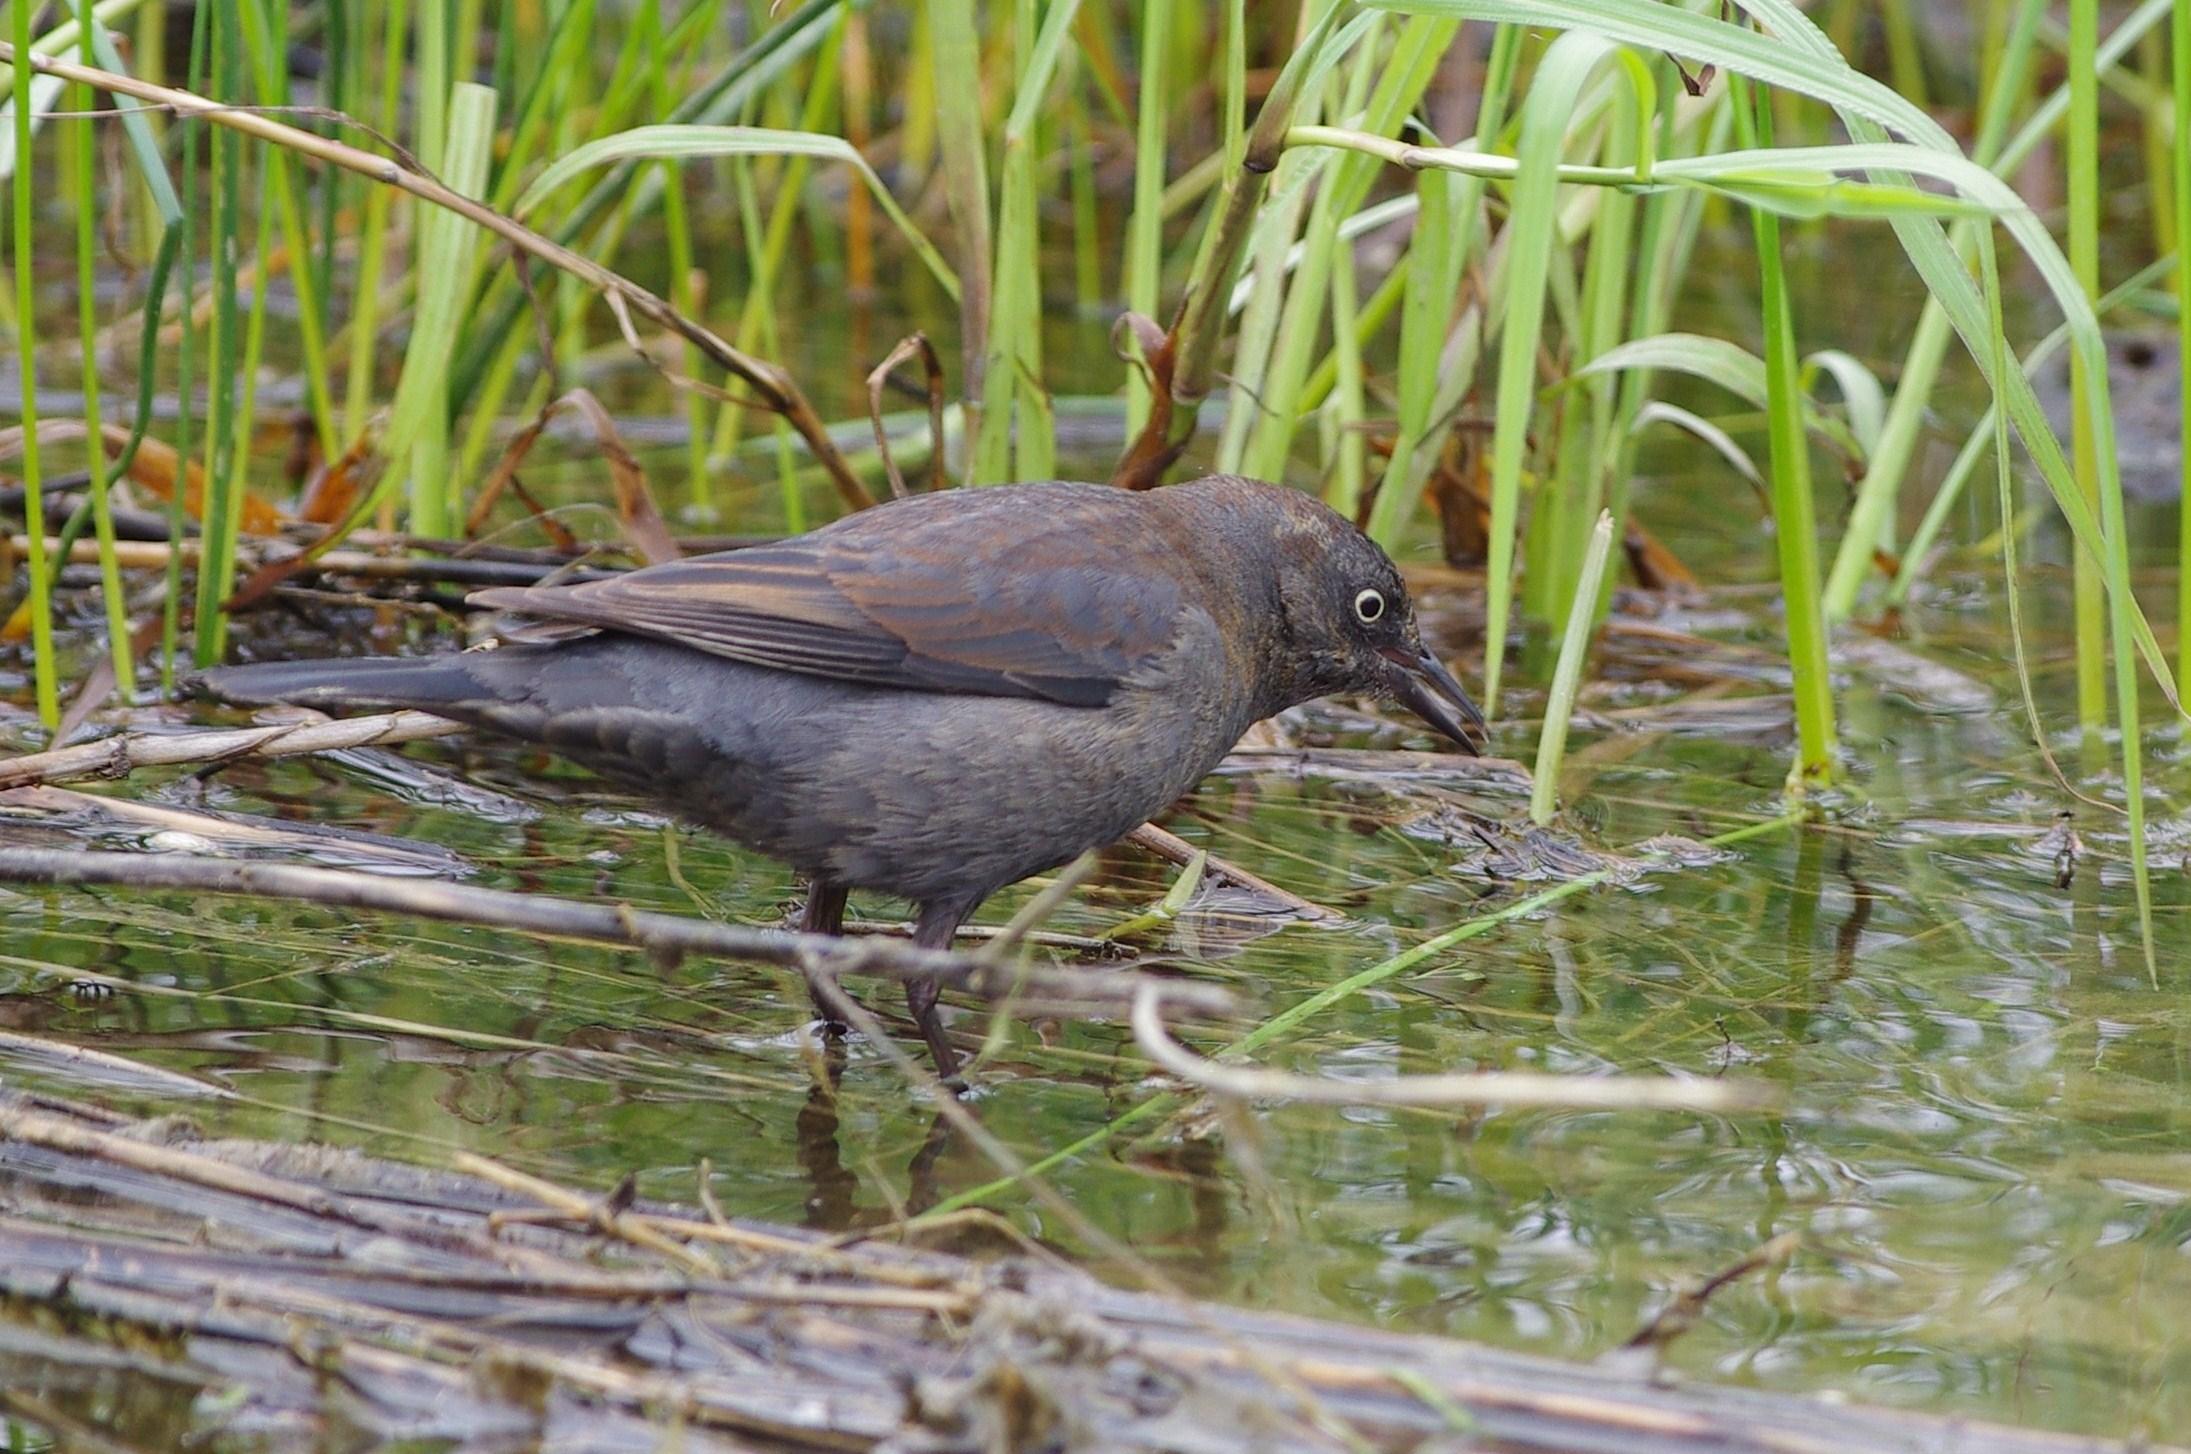 Carmen Hagopian took this photo of the Rusty Blackbird. Excellent!